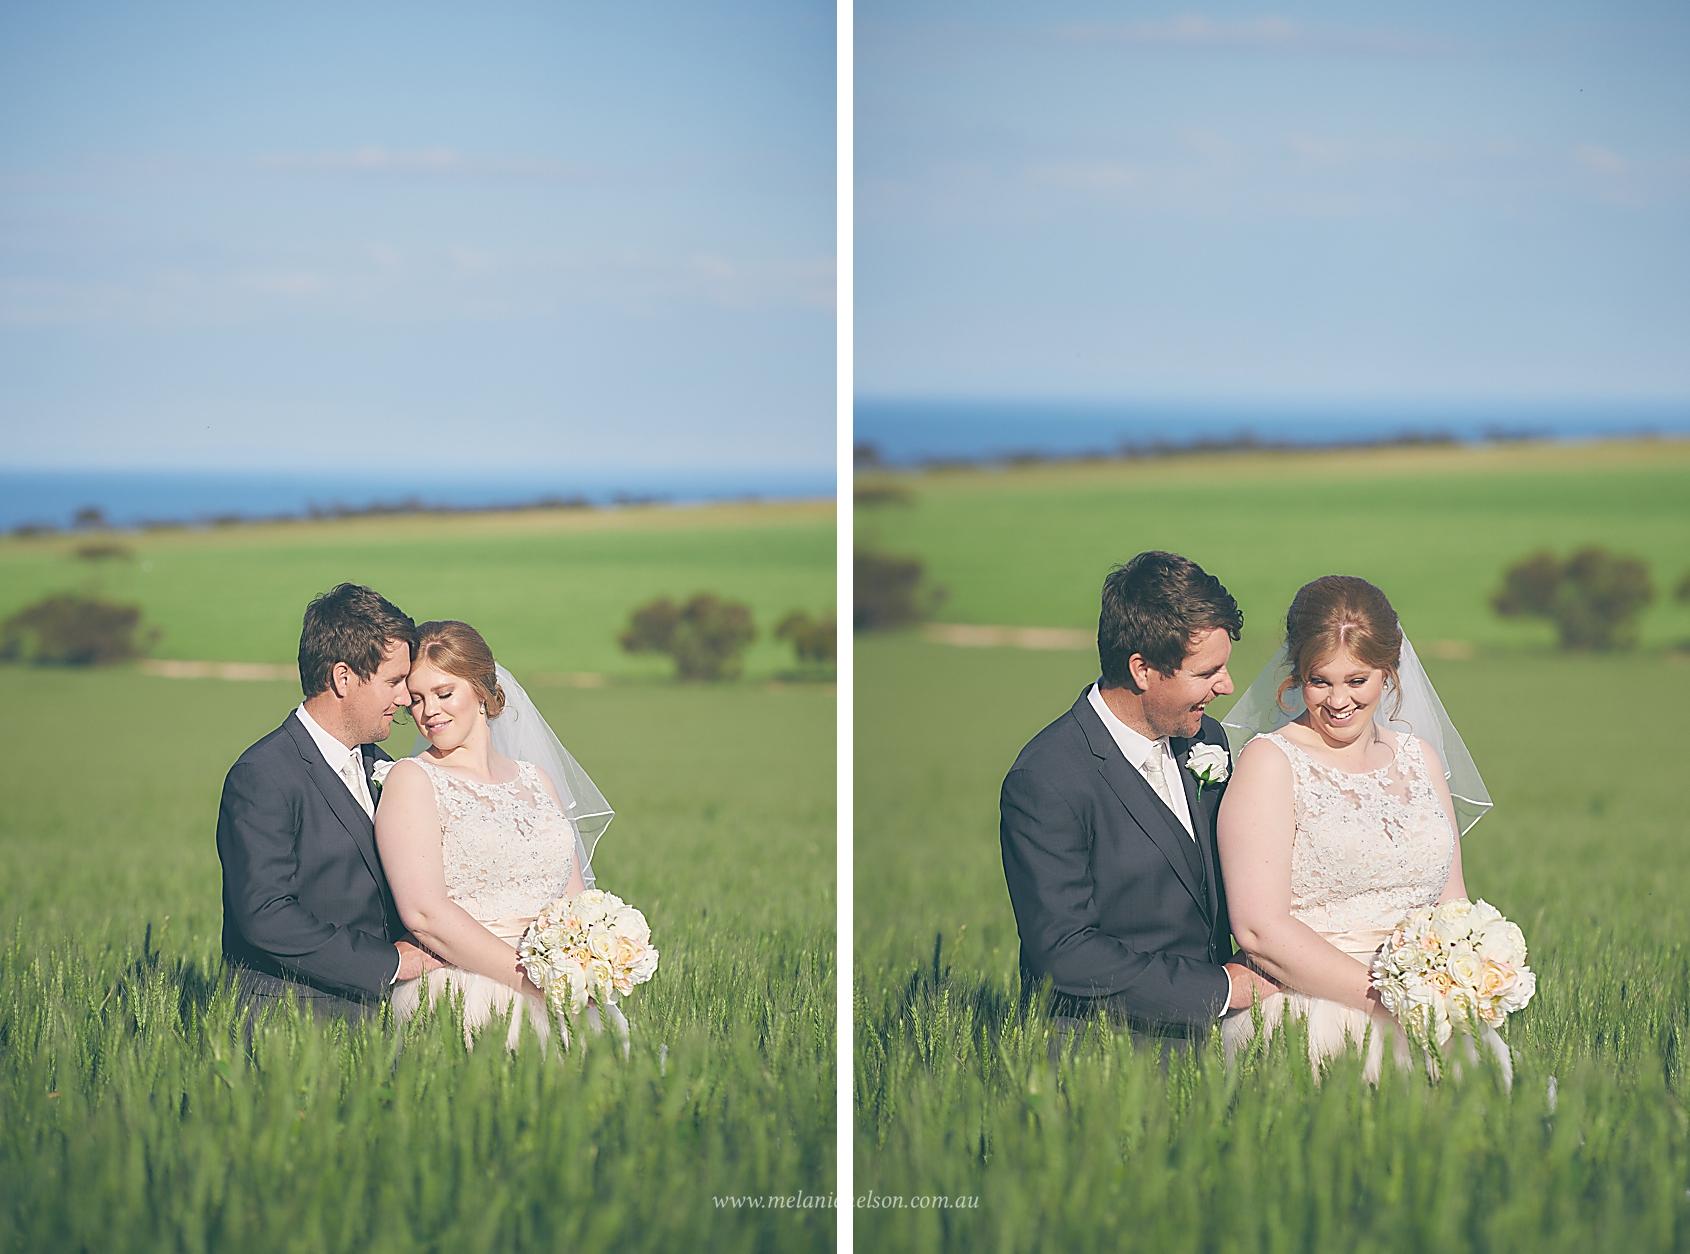 yorke_peninsula_wedding_photographer_0056.jpg